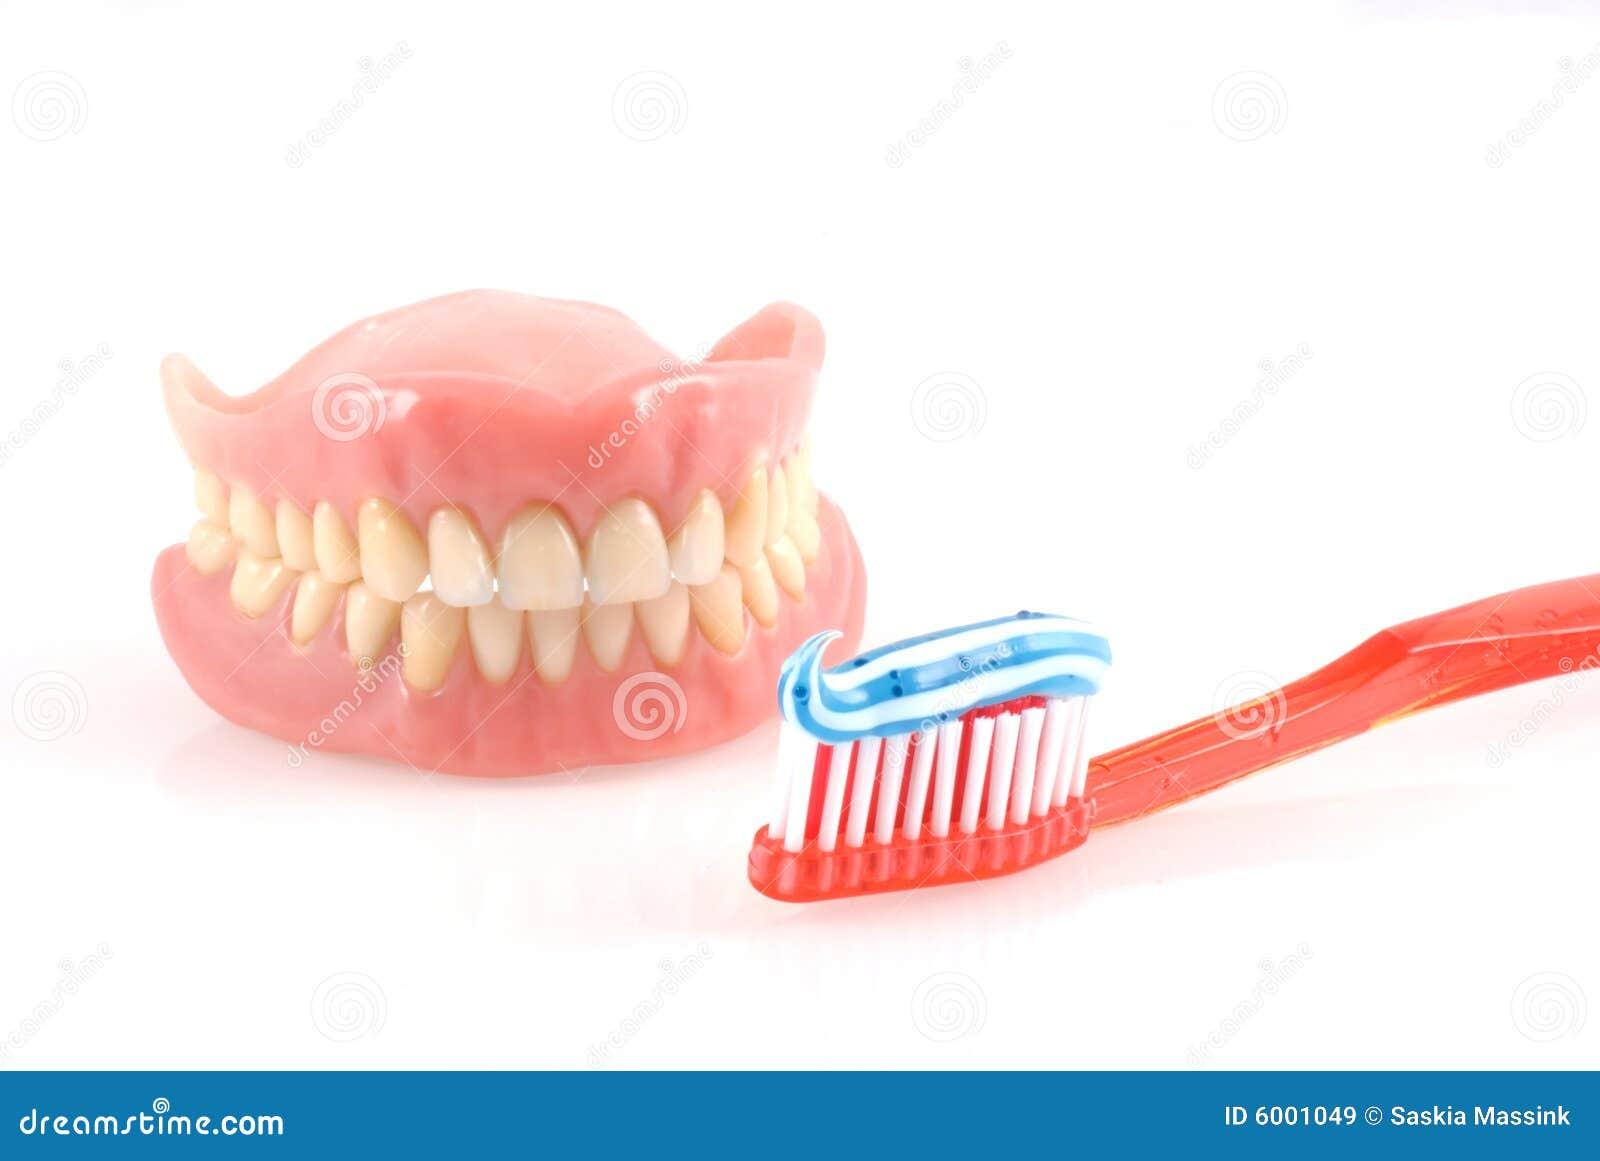 dental-care-6001049.jpg